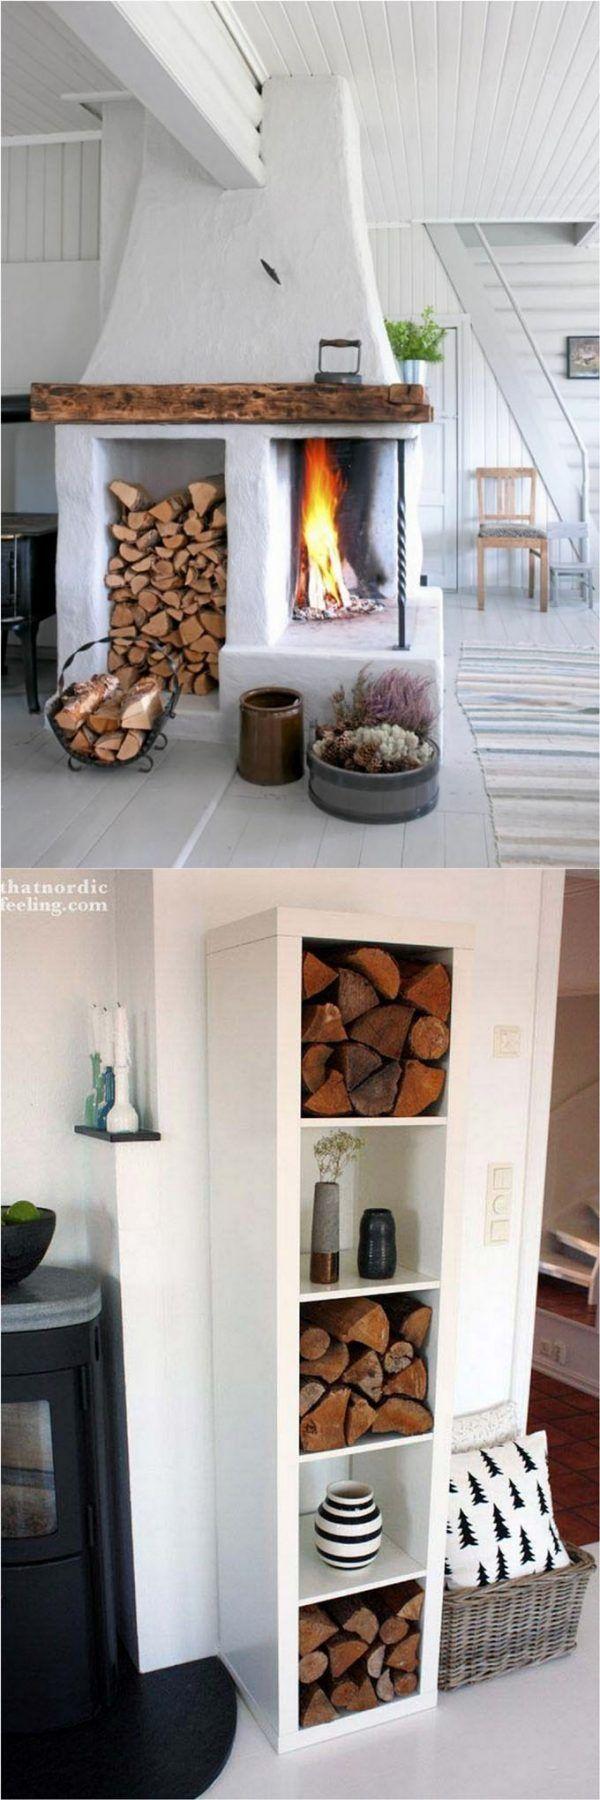 Top 25+ best Indoor firewood rack ideas on Pinterest | Firewood ...